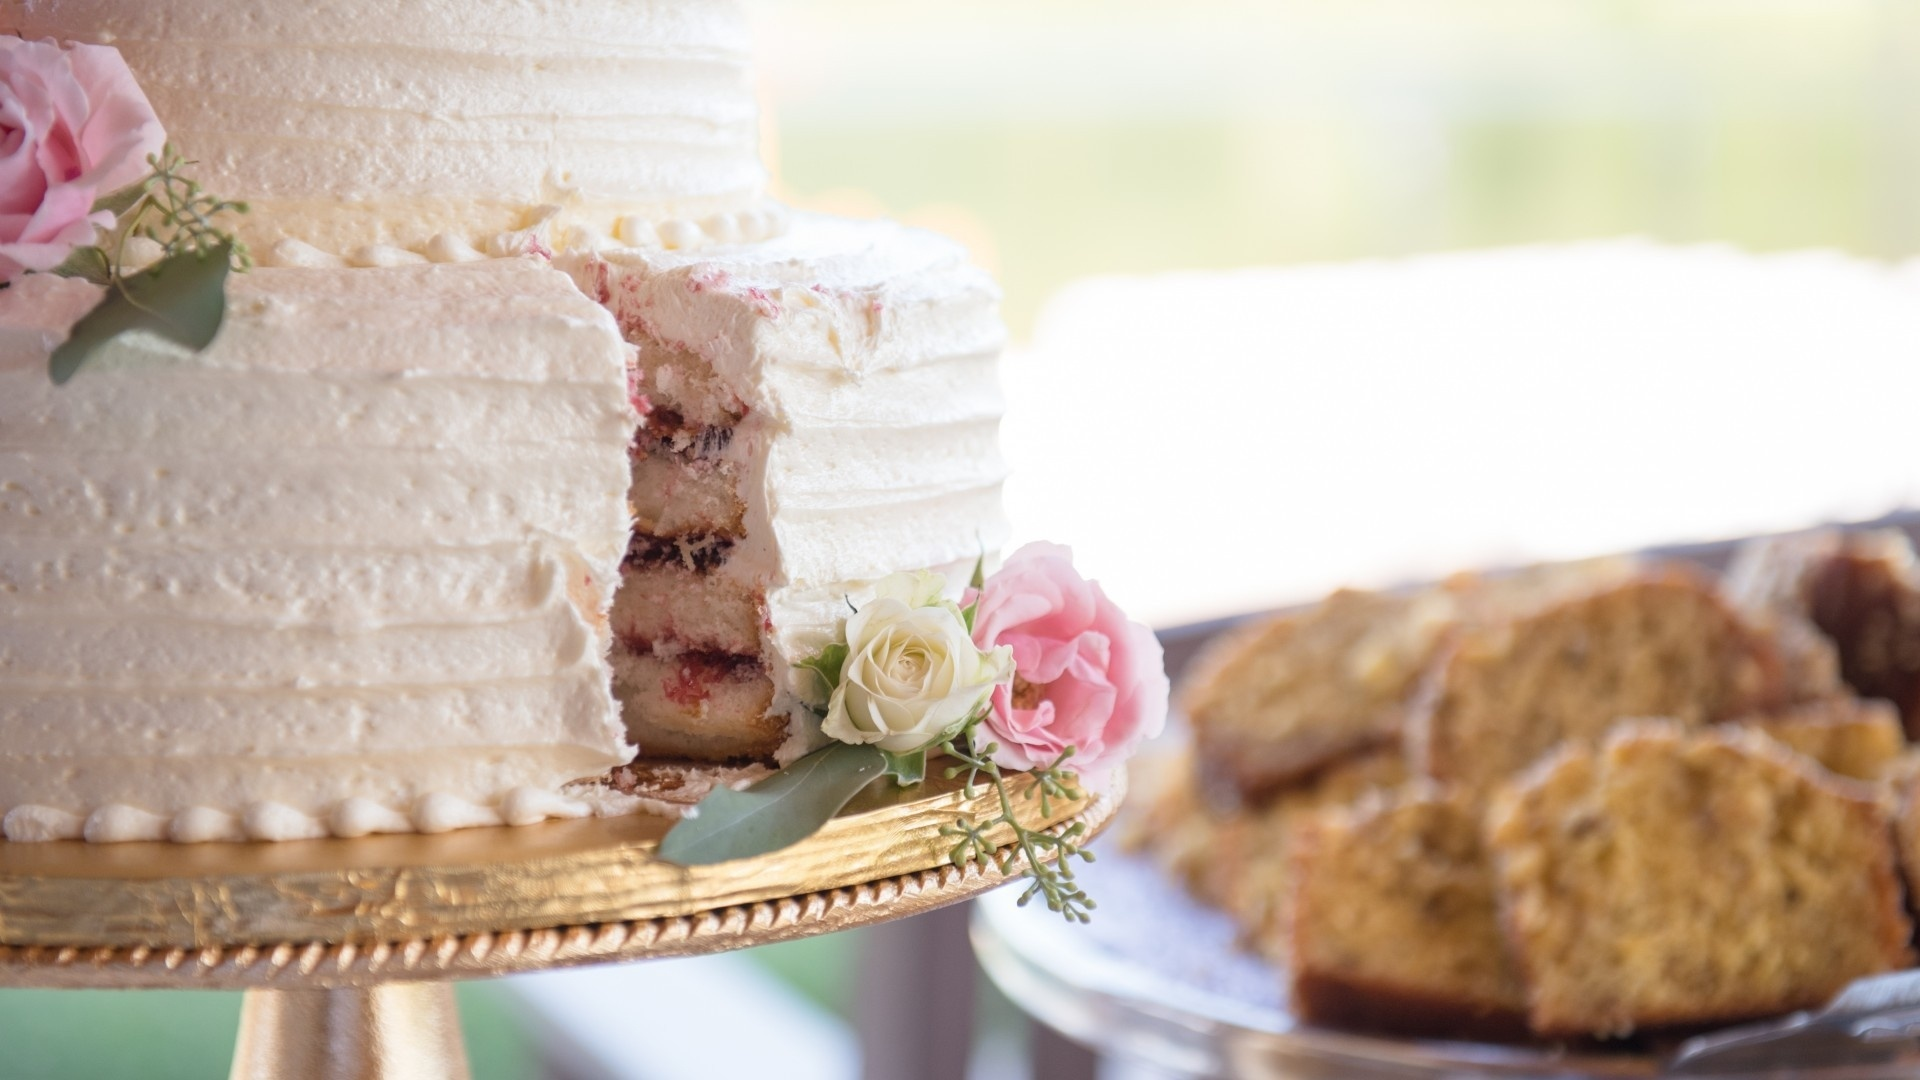 Wedding Cake wallpaper photo hd